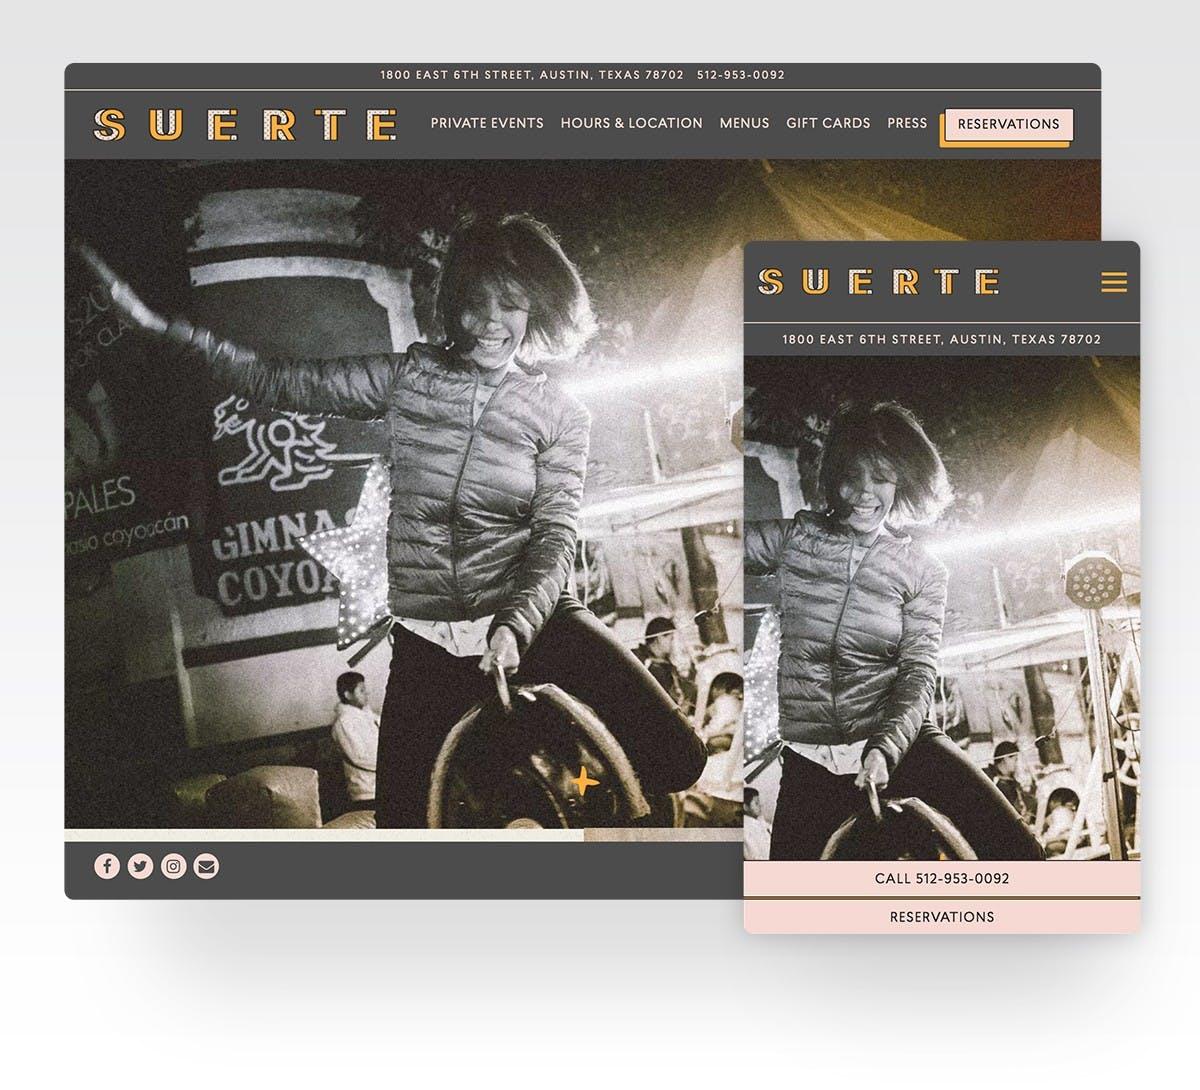 The website for Suerte